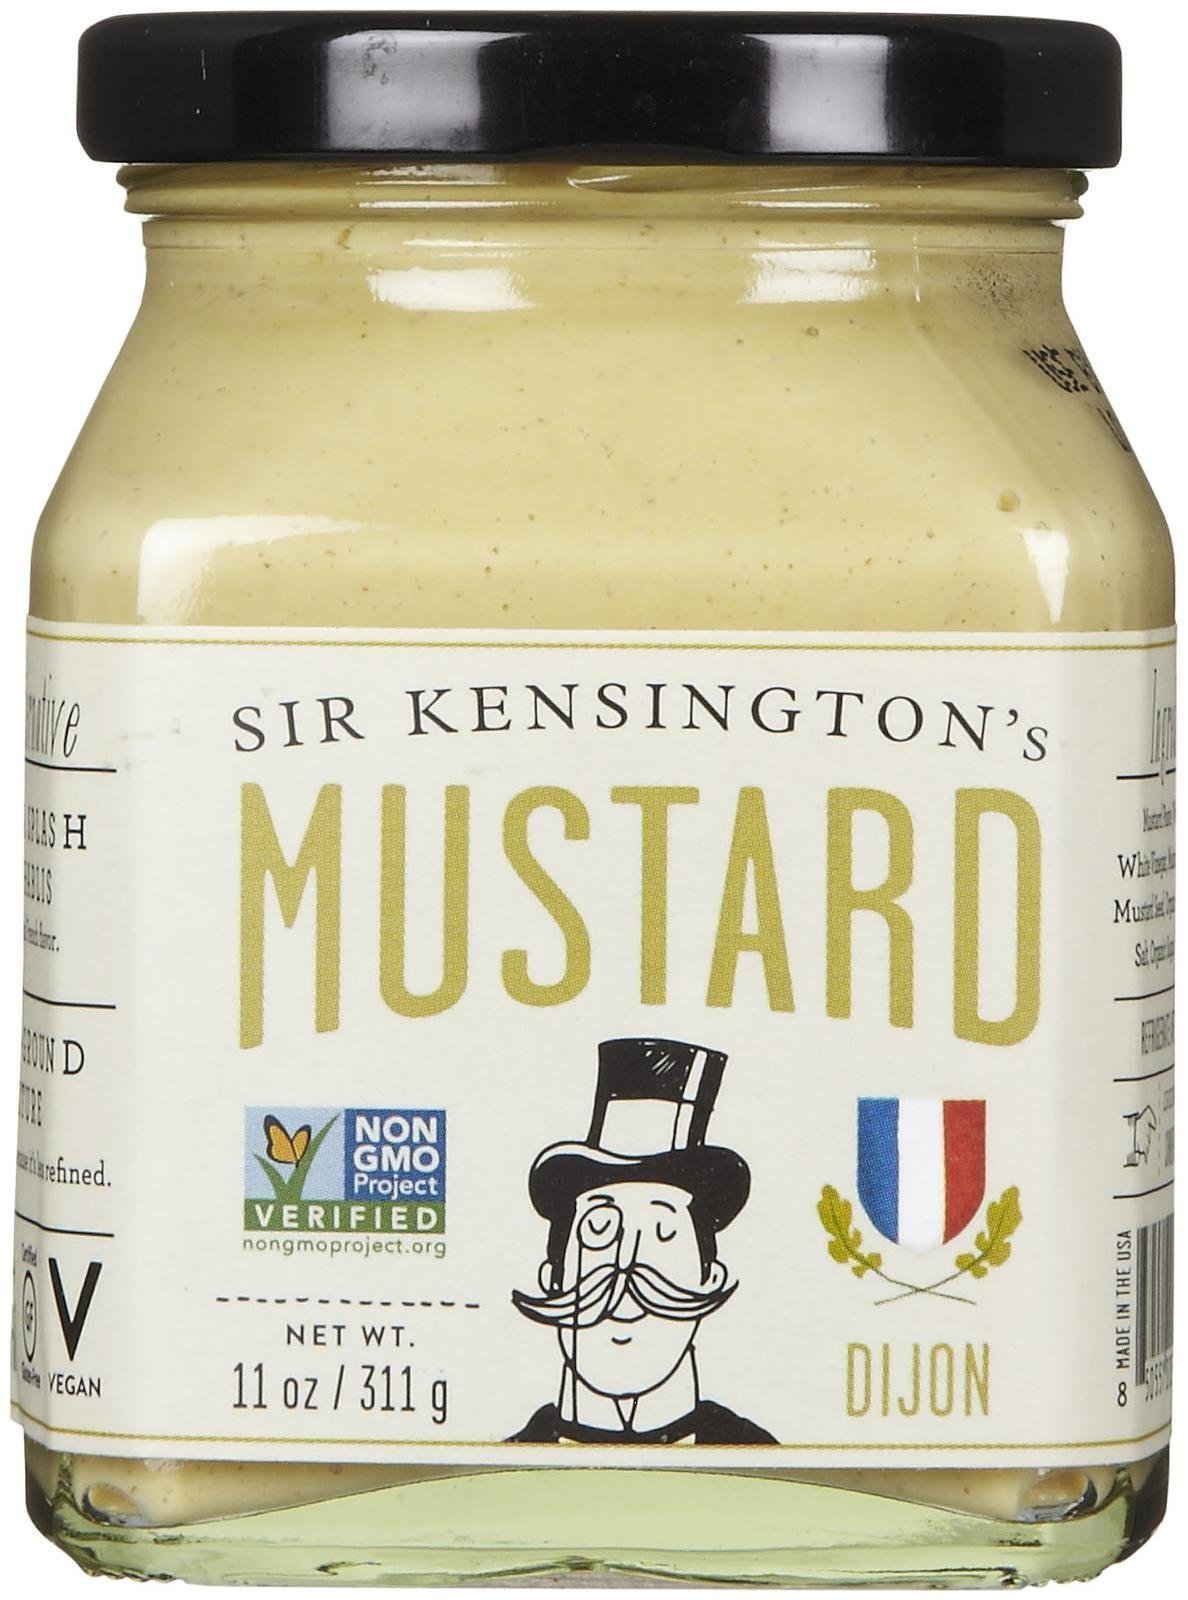 Sir Kensington's Mustard - Dijon - 11 OZ